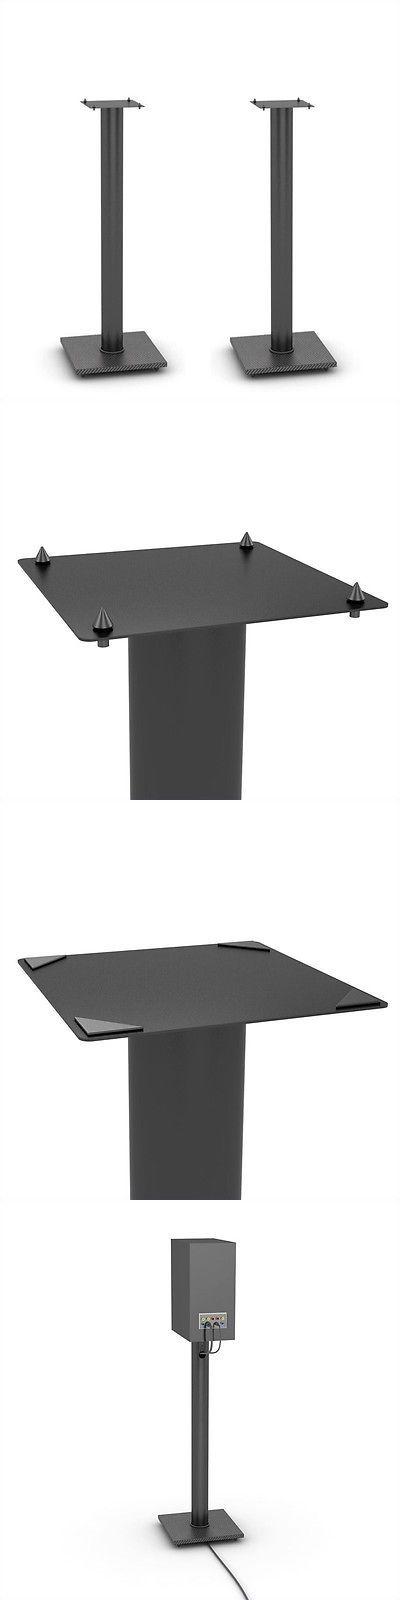 Speaker Mounts and Stands: Atlantic Inc. Adjustable Bookshelf Speaker Stand Stands In Black BUY IT NOW ONLY: $58.15